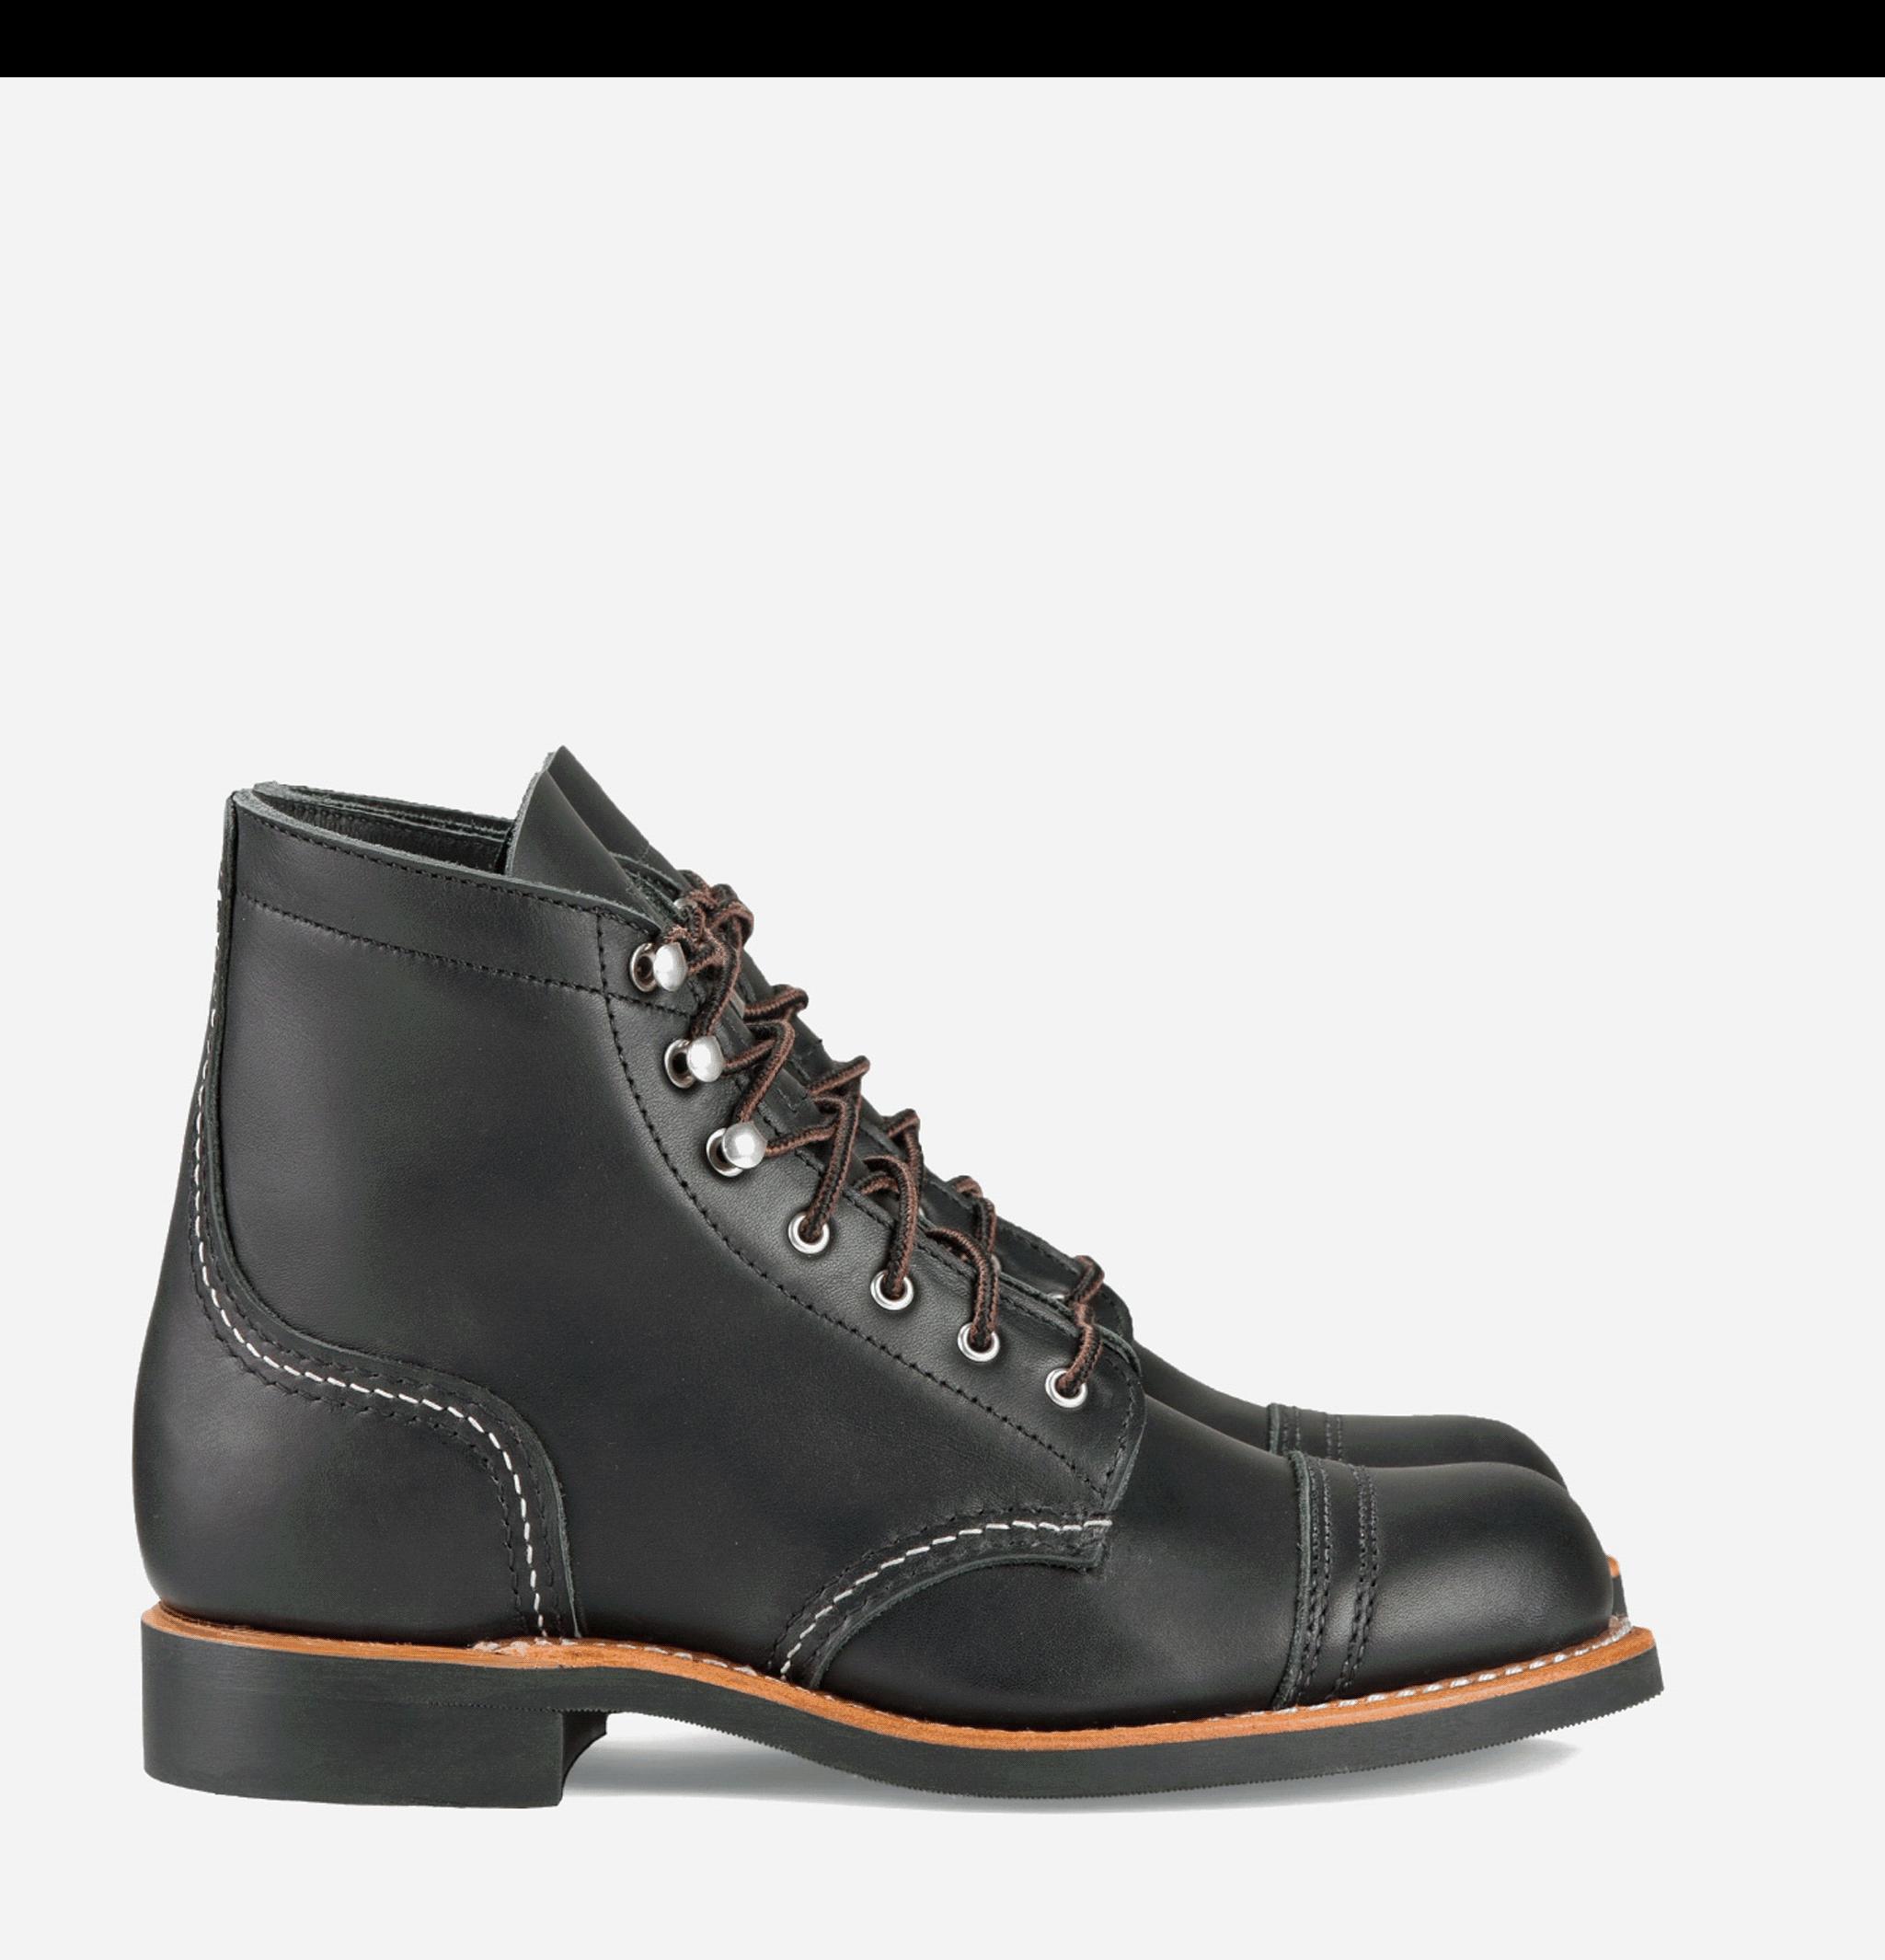 3366 - Iron Ranger Black